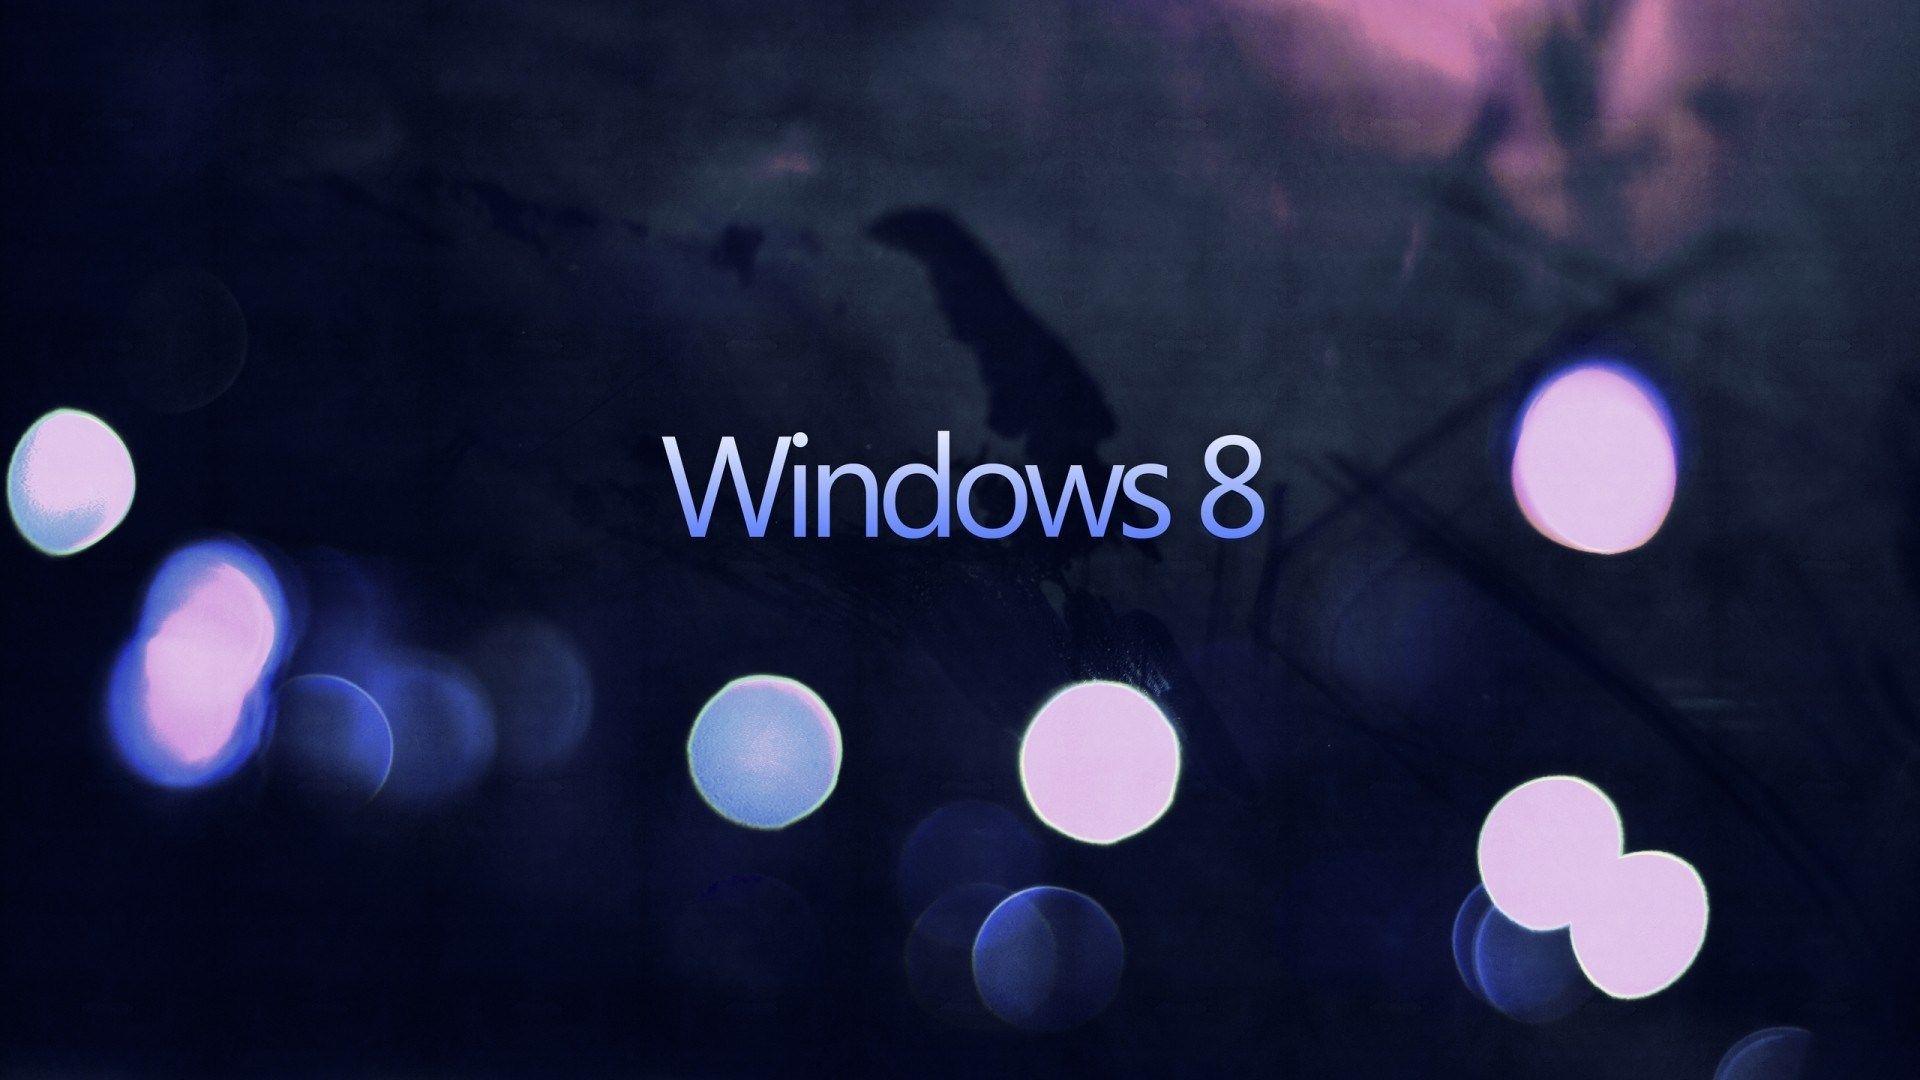 windows 8 background hd - windows 8 category | gogolmogol | pinterest